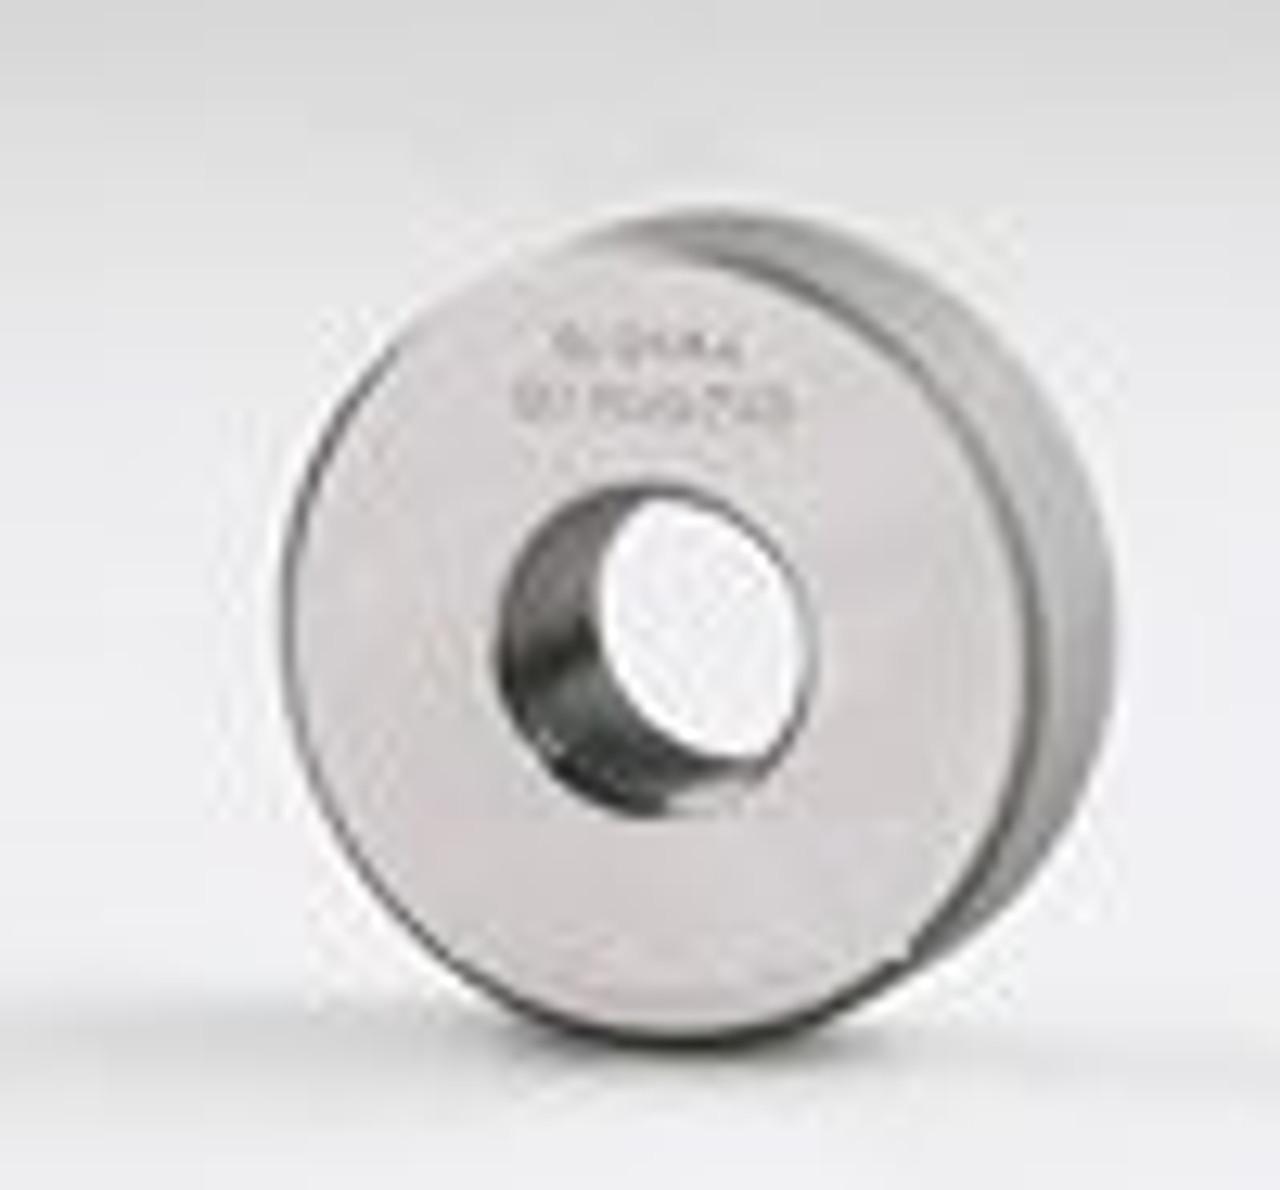 "BSW 1-1/8"" - 7 GO Thread Ring Gauge - (BSW1-1/8RG-GO)"